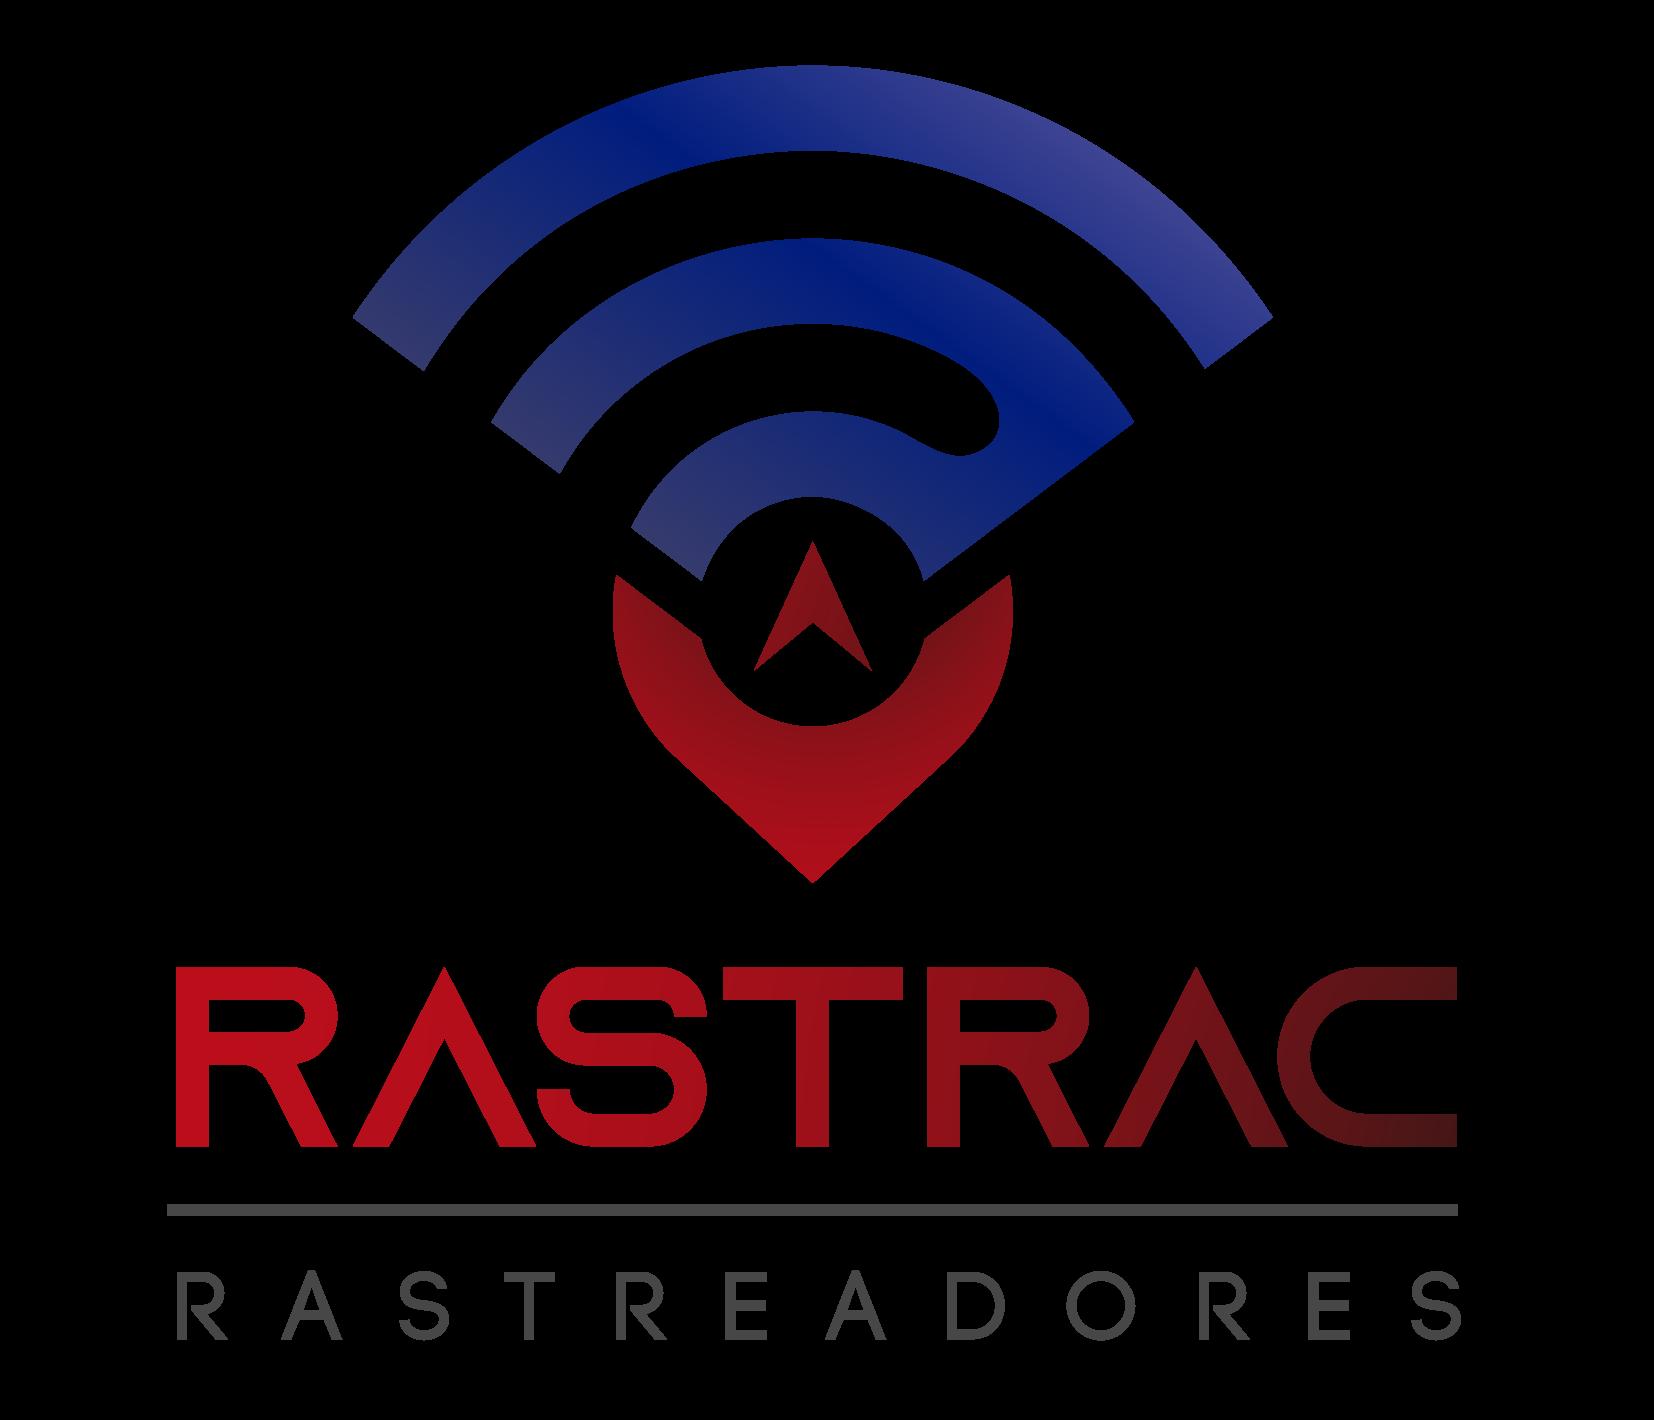 RASTRAC